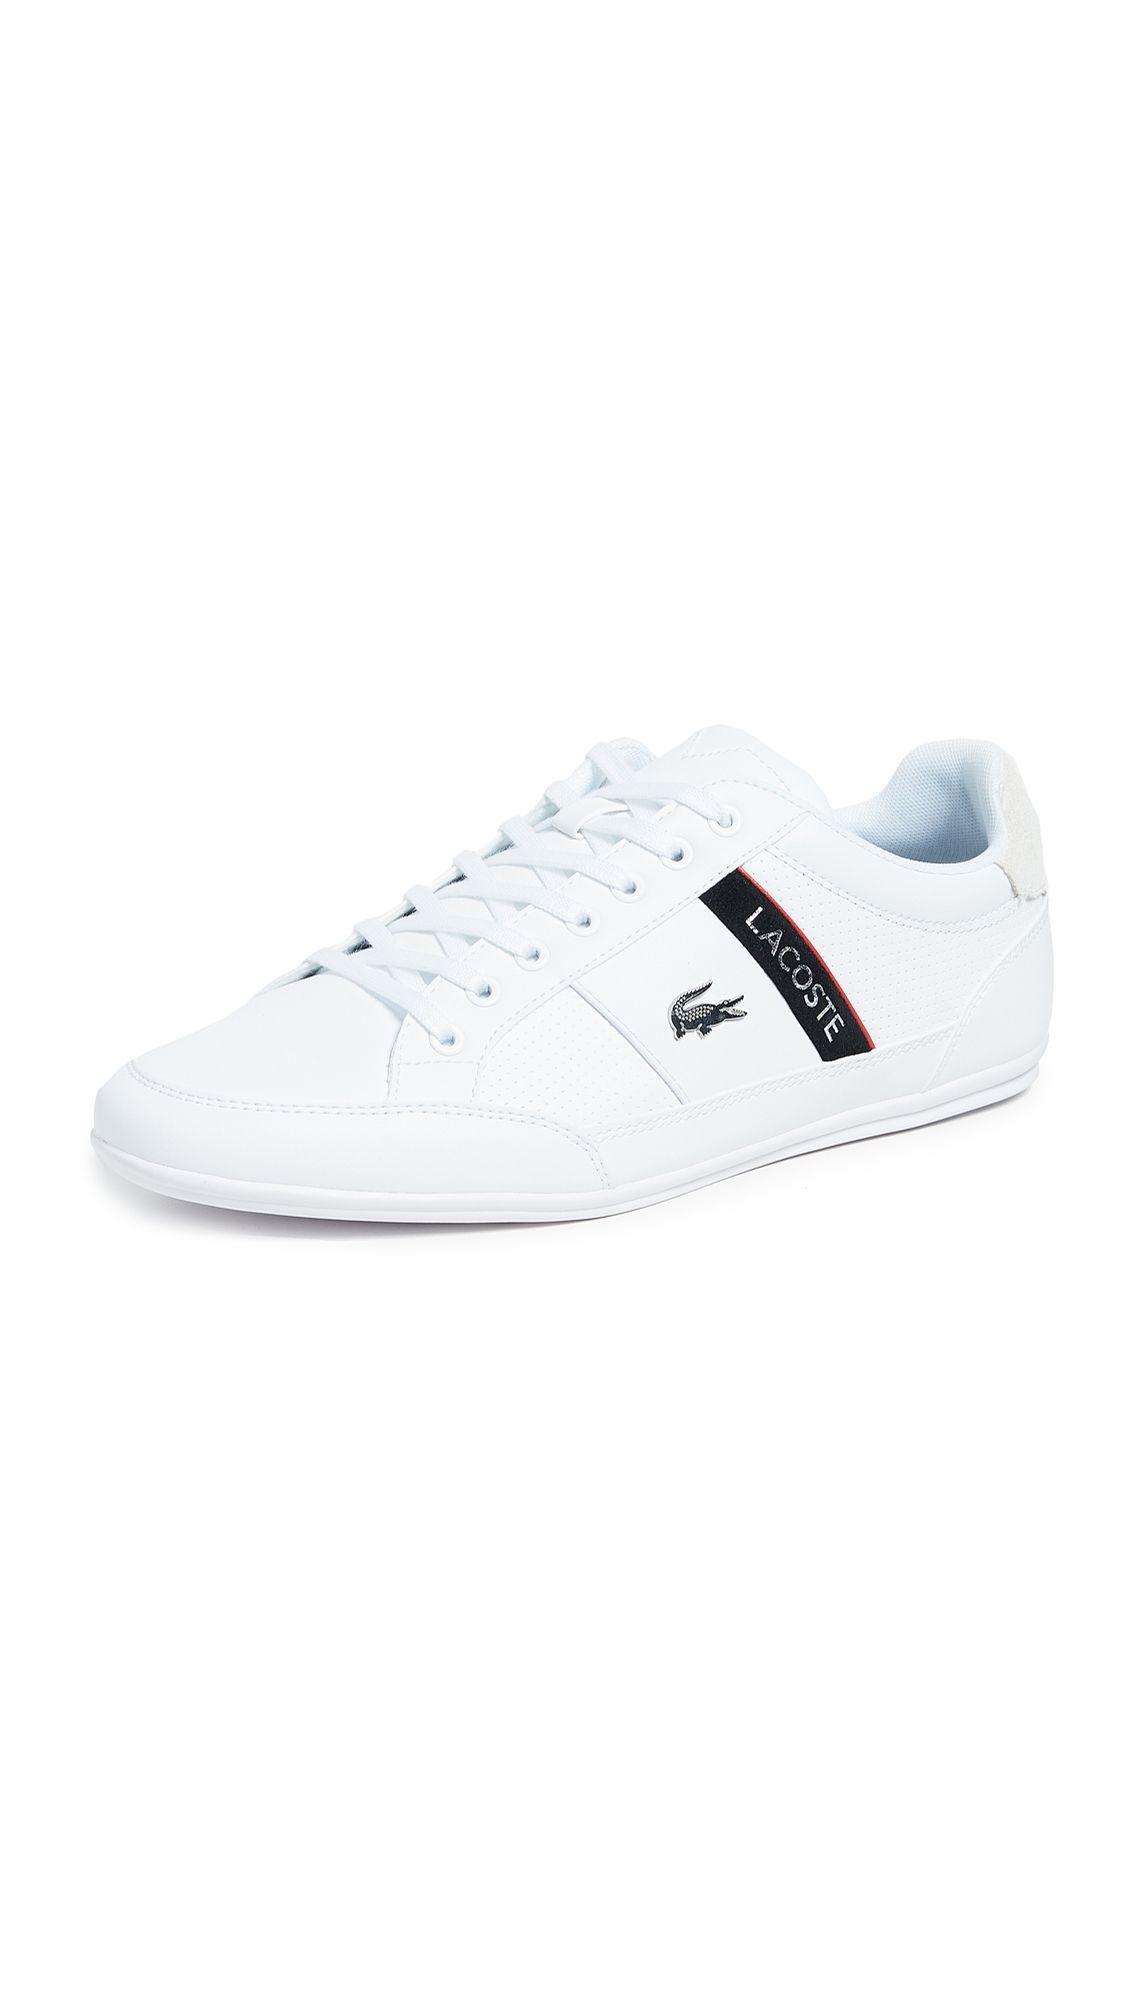 Lacoste Chaymon Low Profile Sneakers In White Modesens Lacoste Shoes Mens Lacoste Sneakers Sneakers